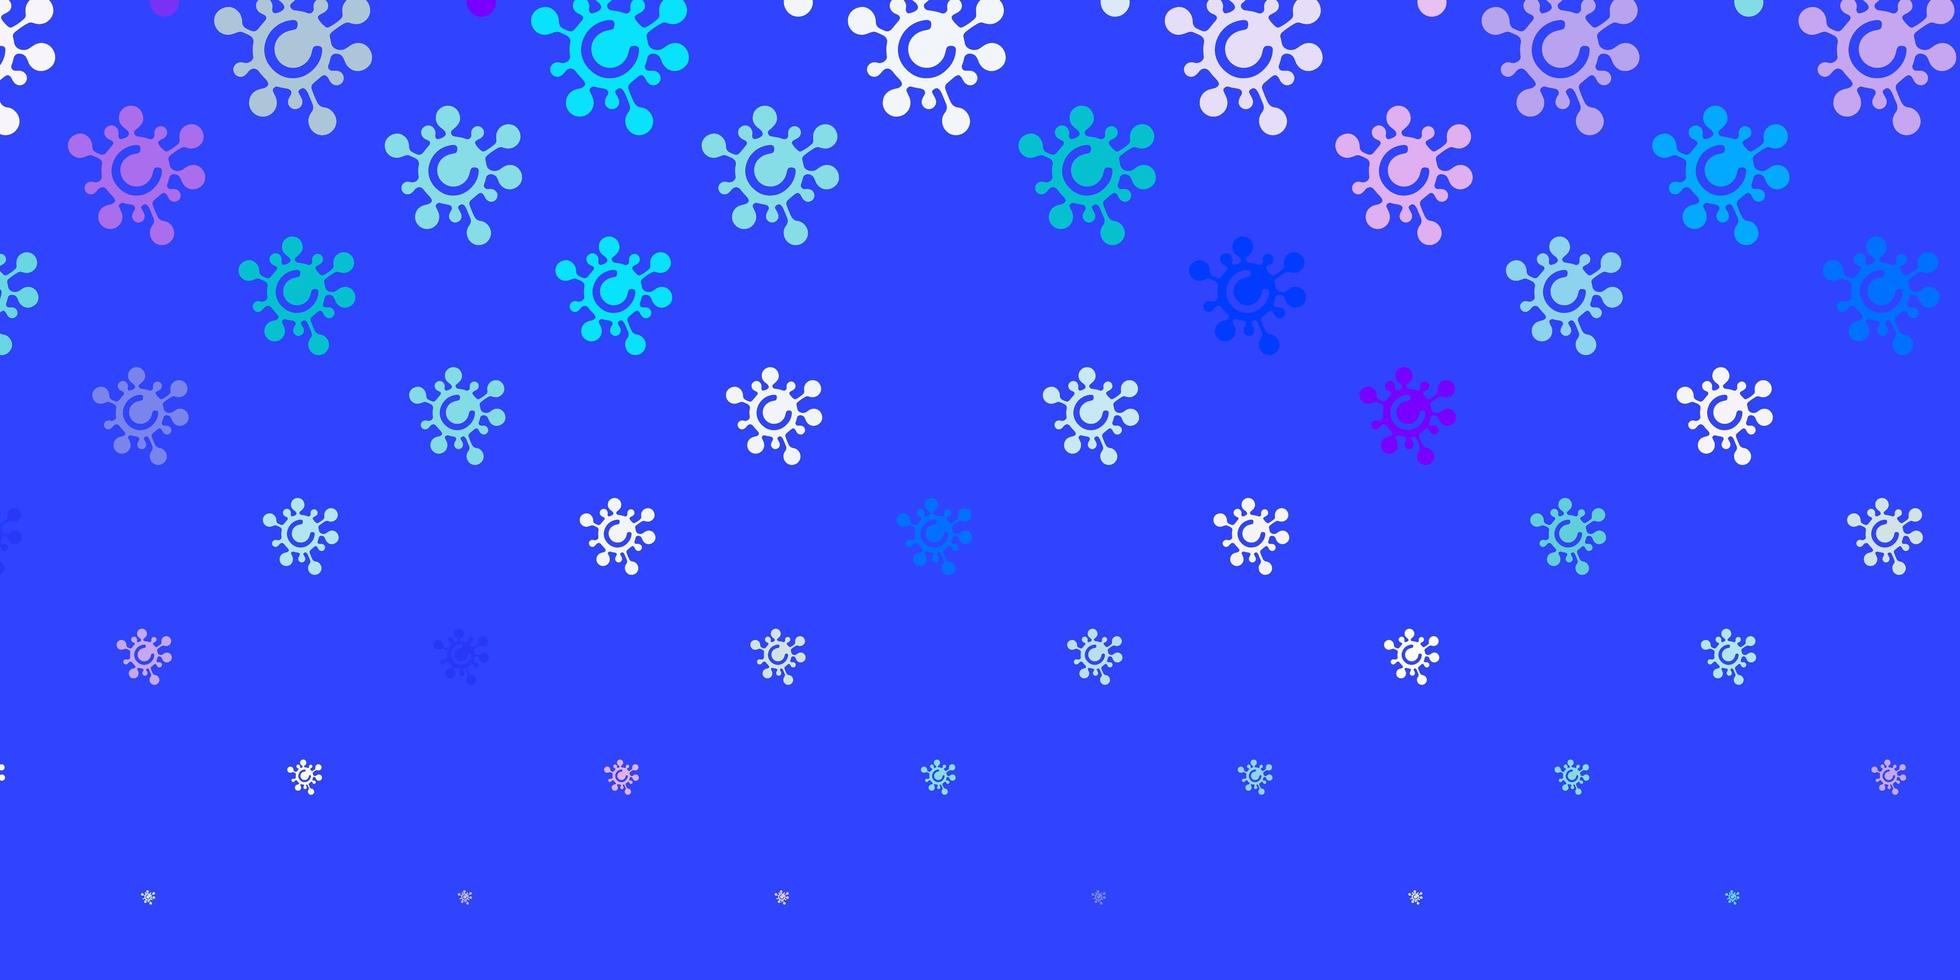 blå, rosa mall med influensatecken. vektor